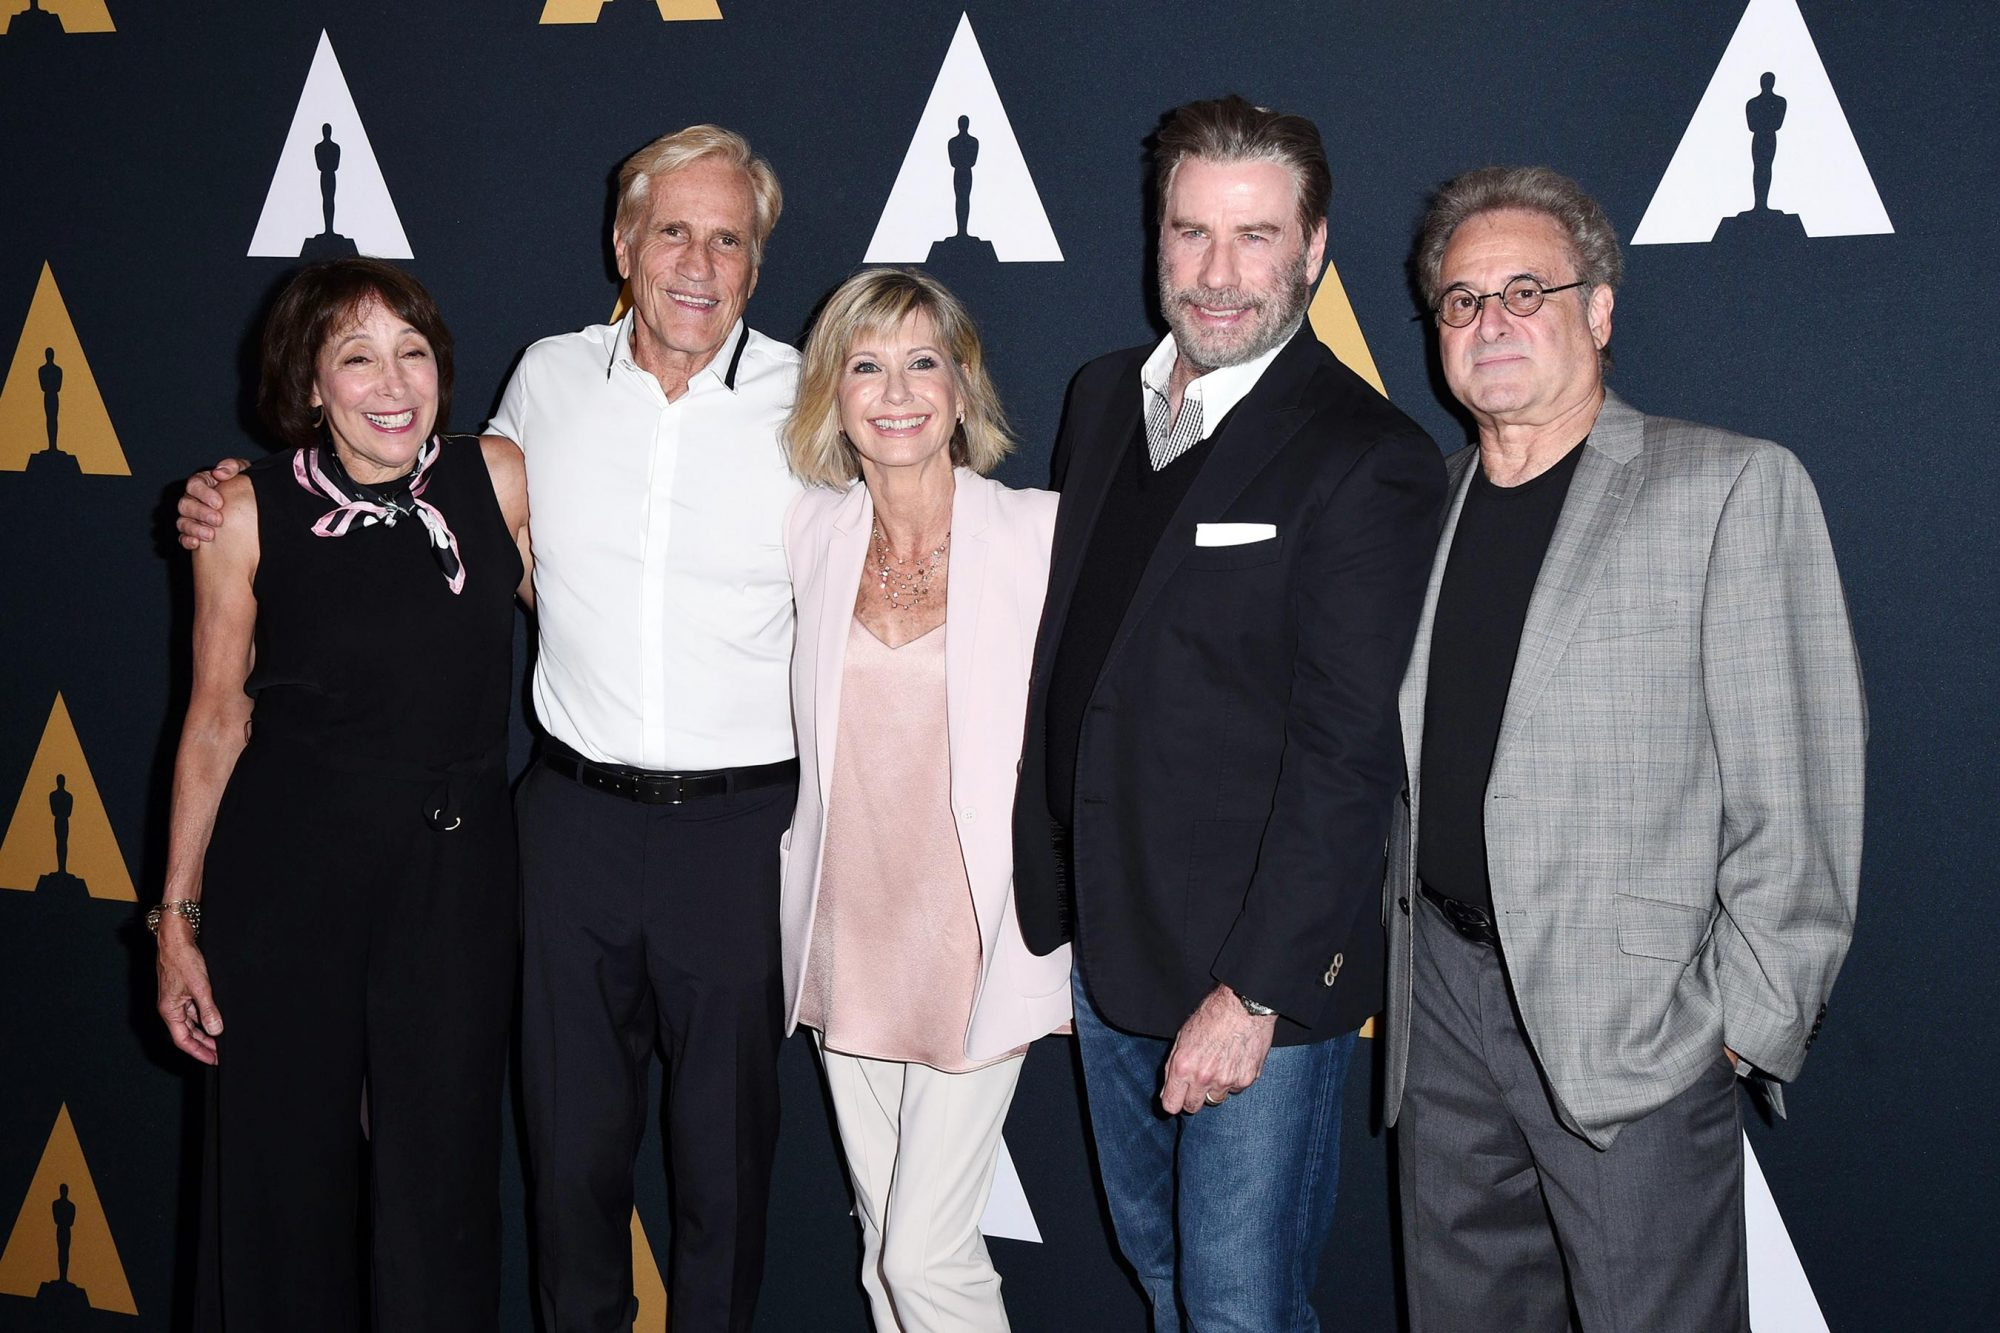 'Grease' 40th Anniversary film screening, Los Angeles, USA - 15 Aug 2018